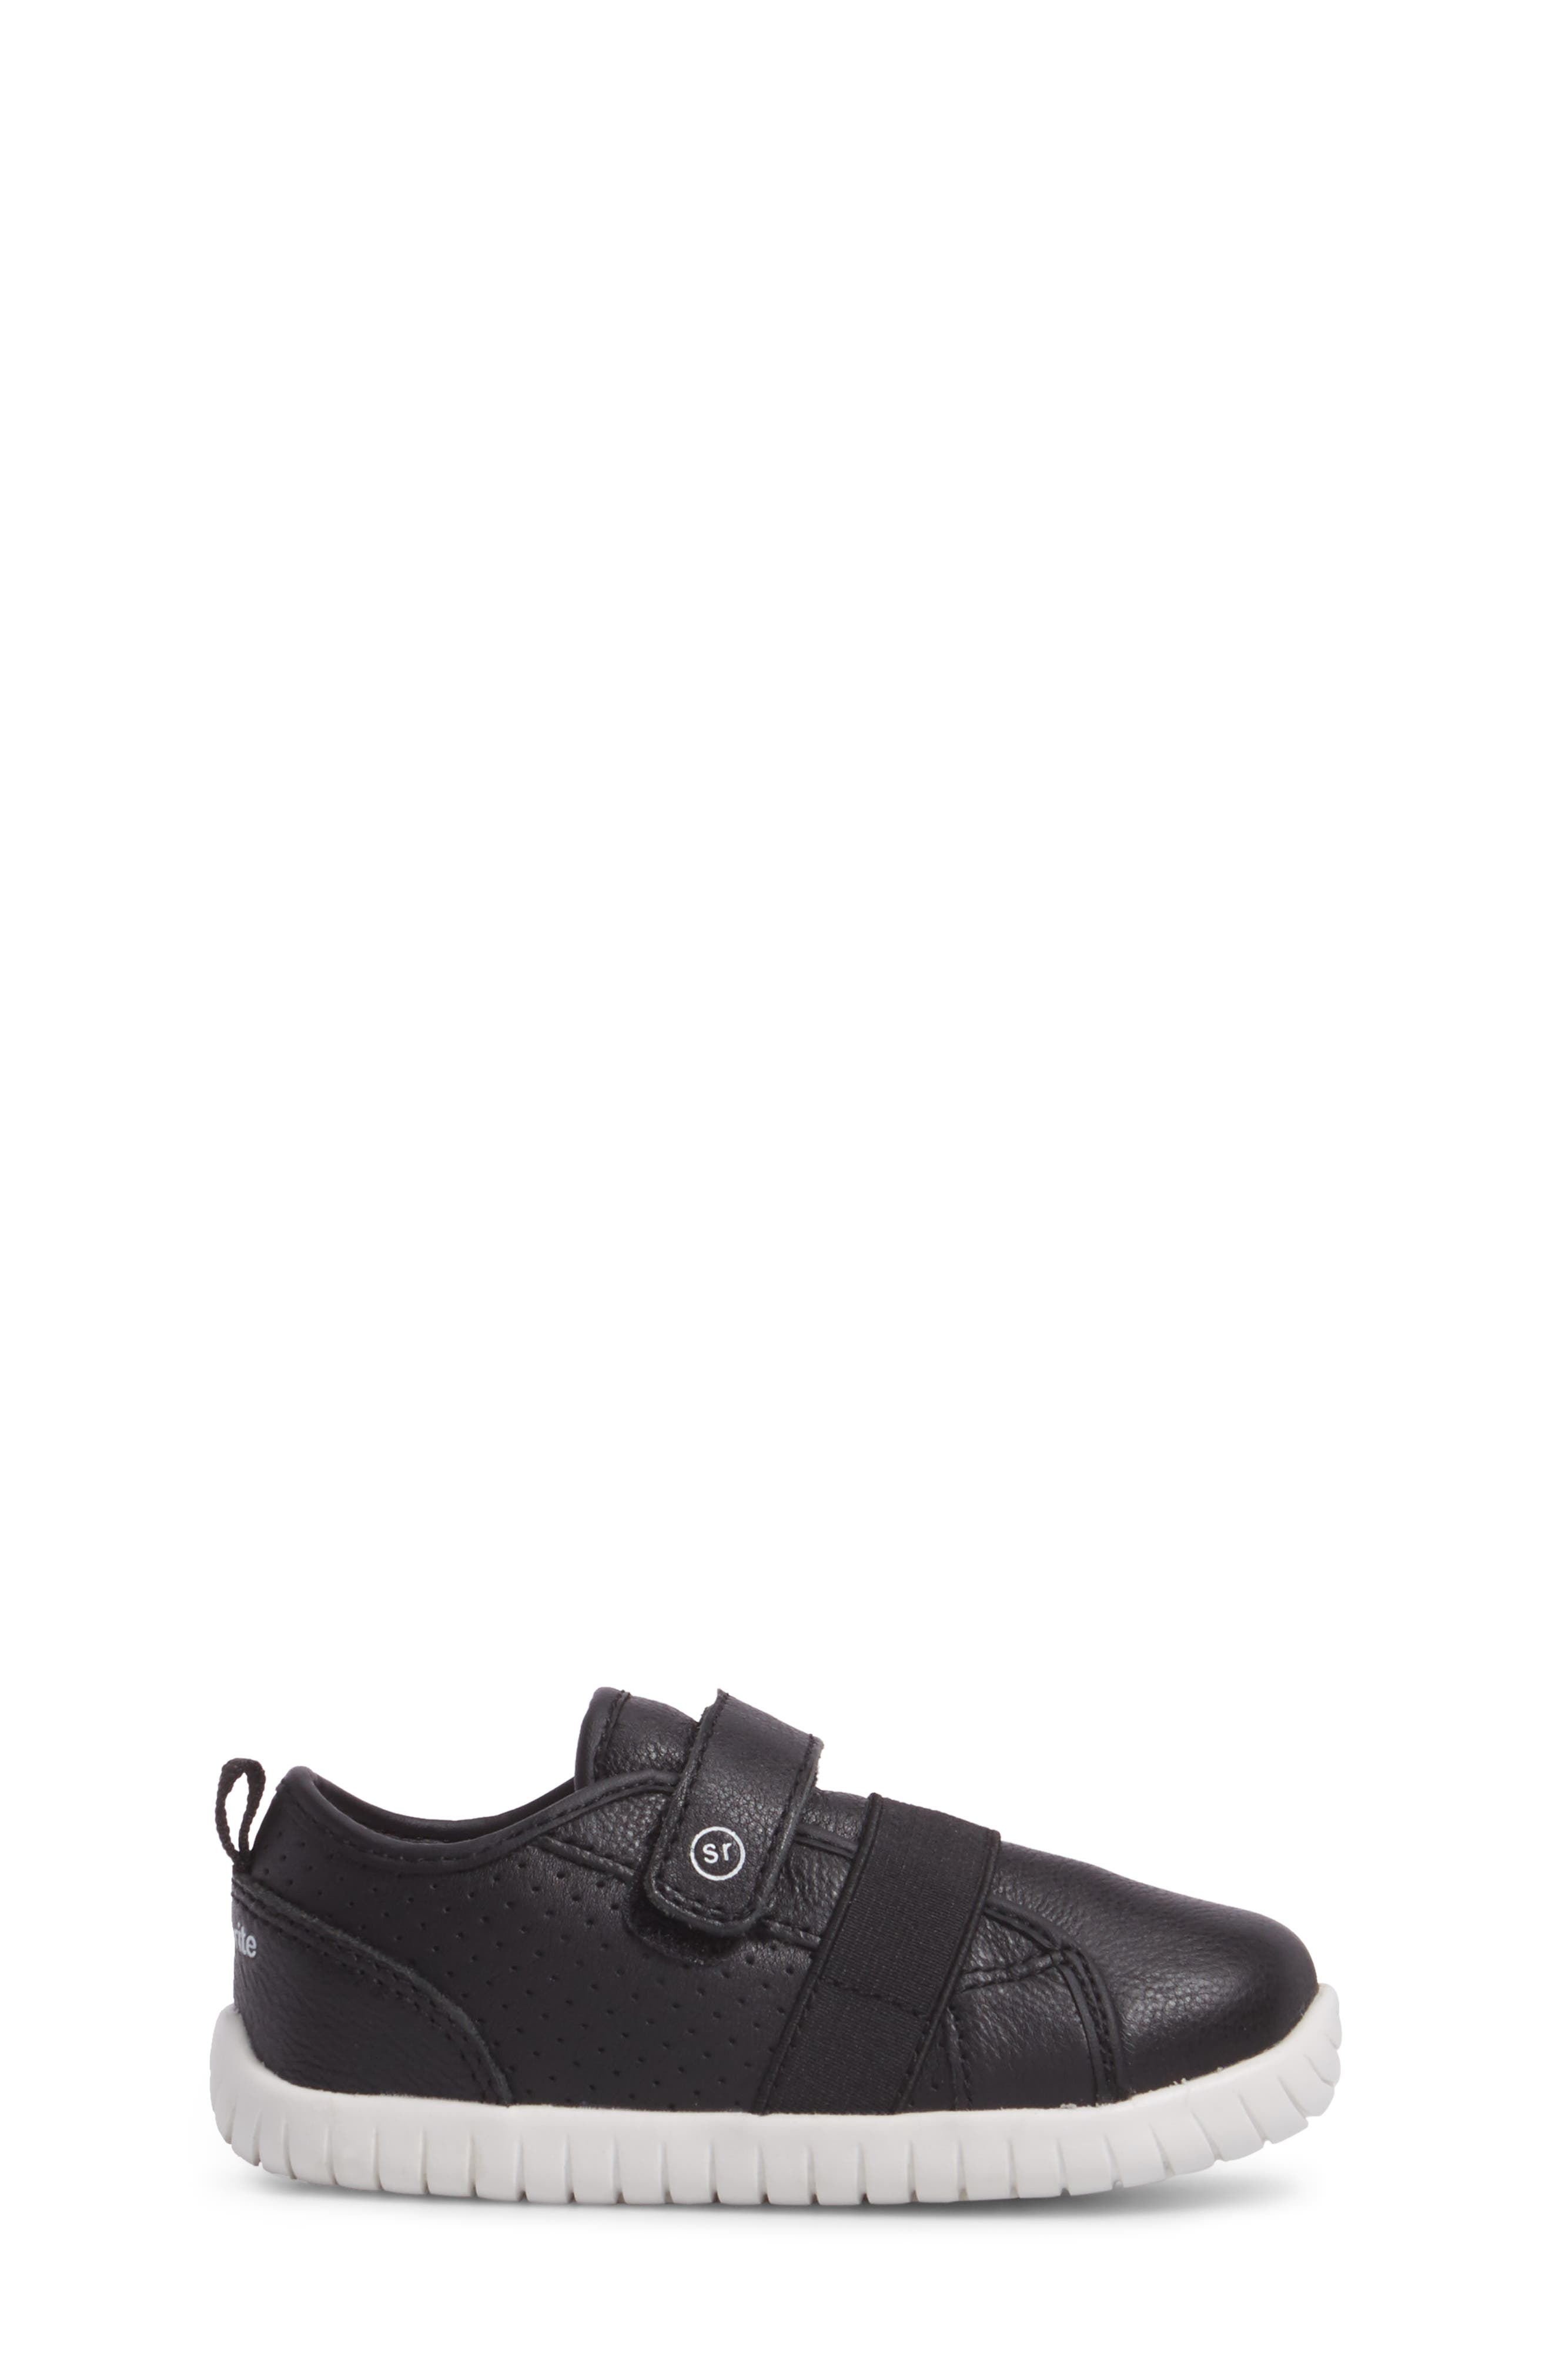 SRT Riley Sneaker,                             Alternate thumbnail 3, color,                             Black Leather